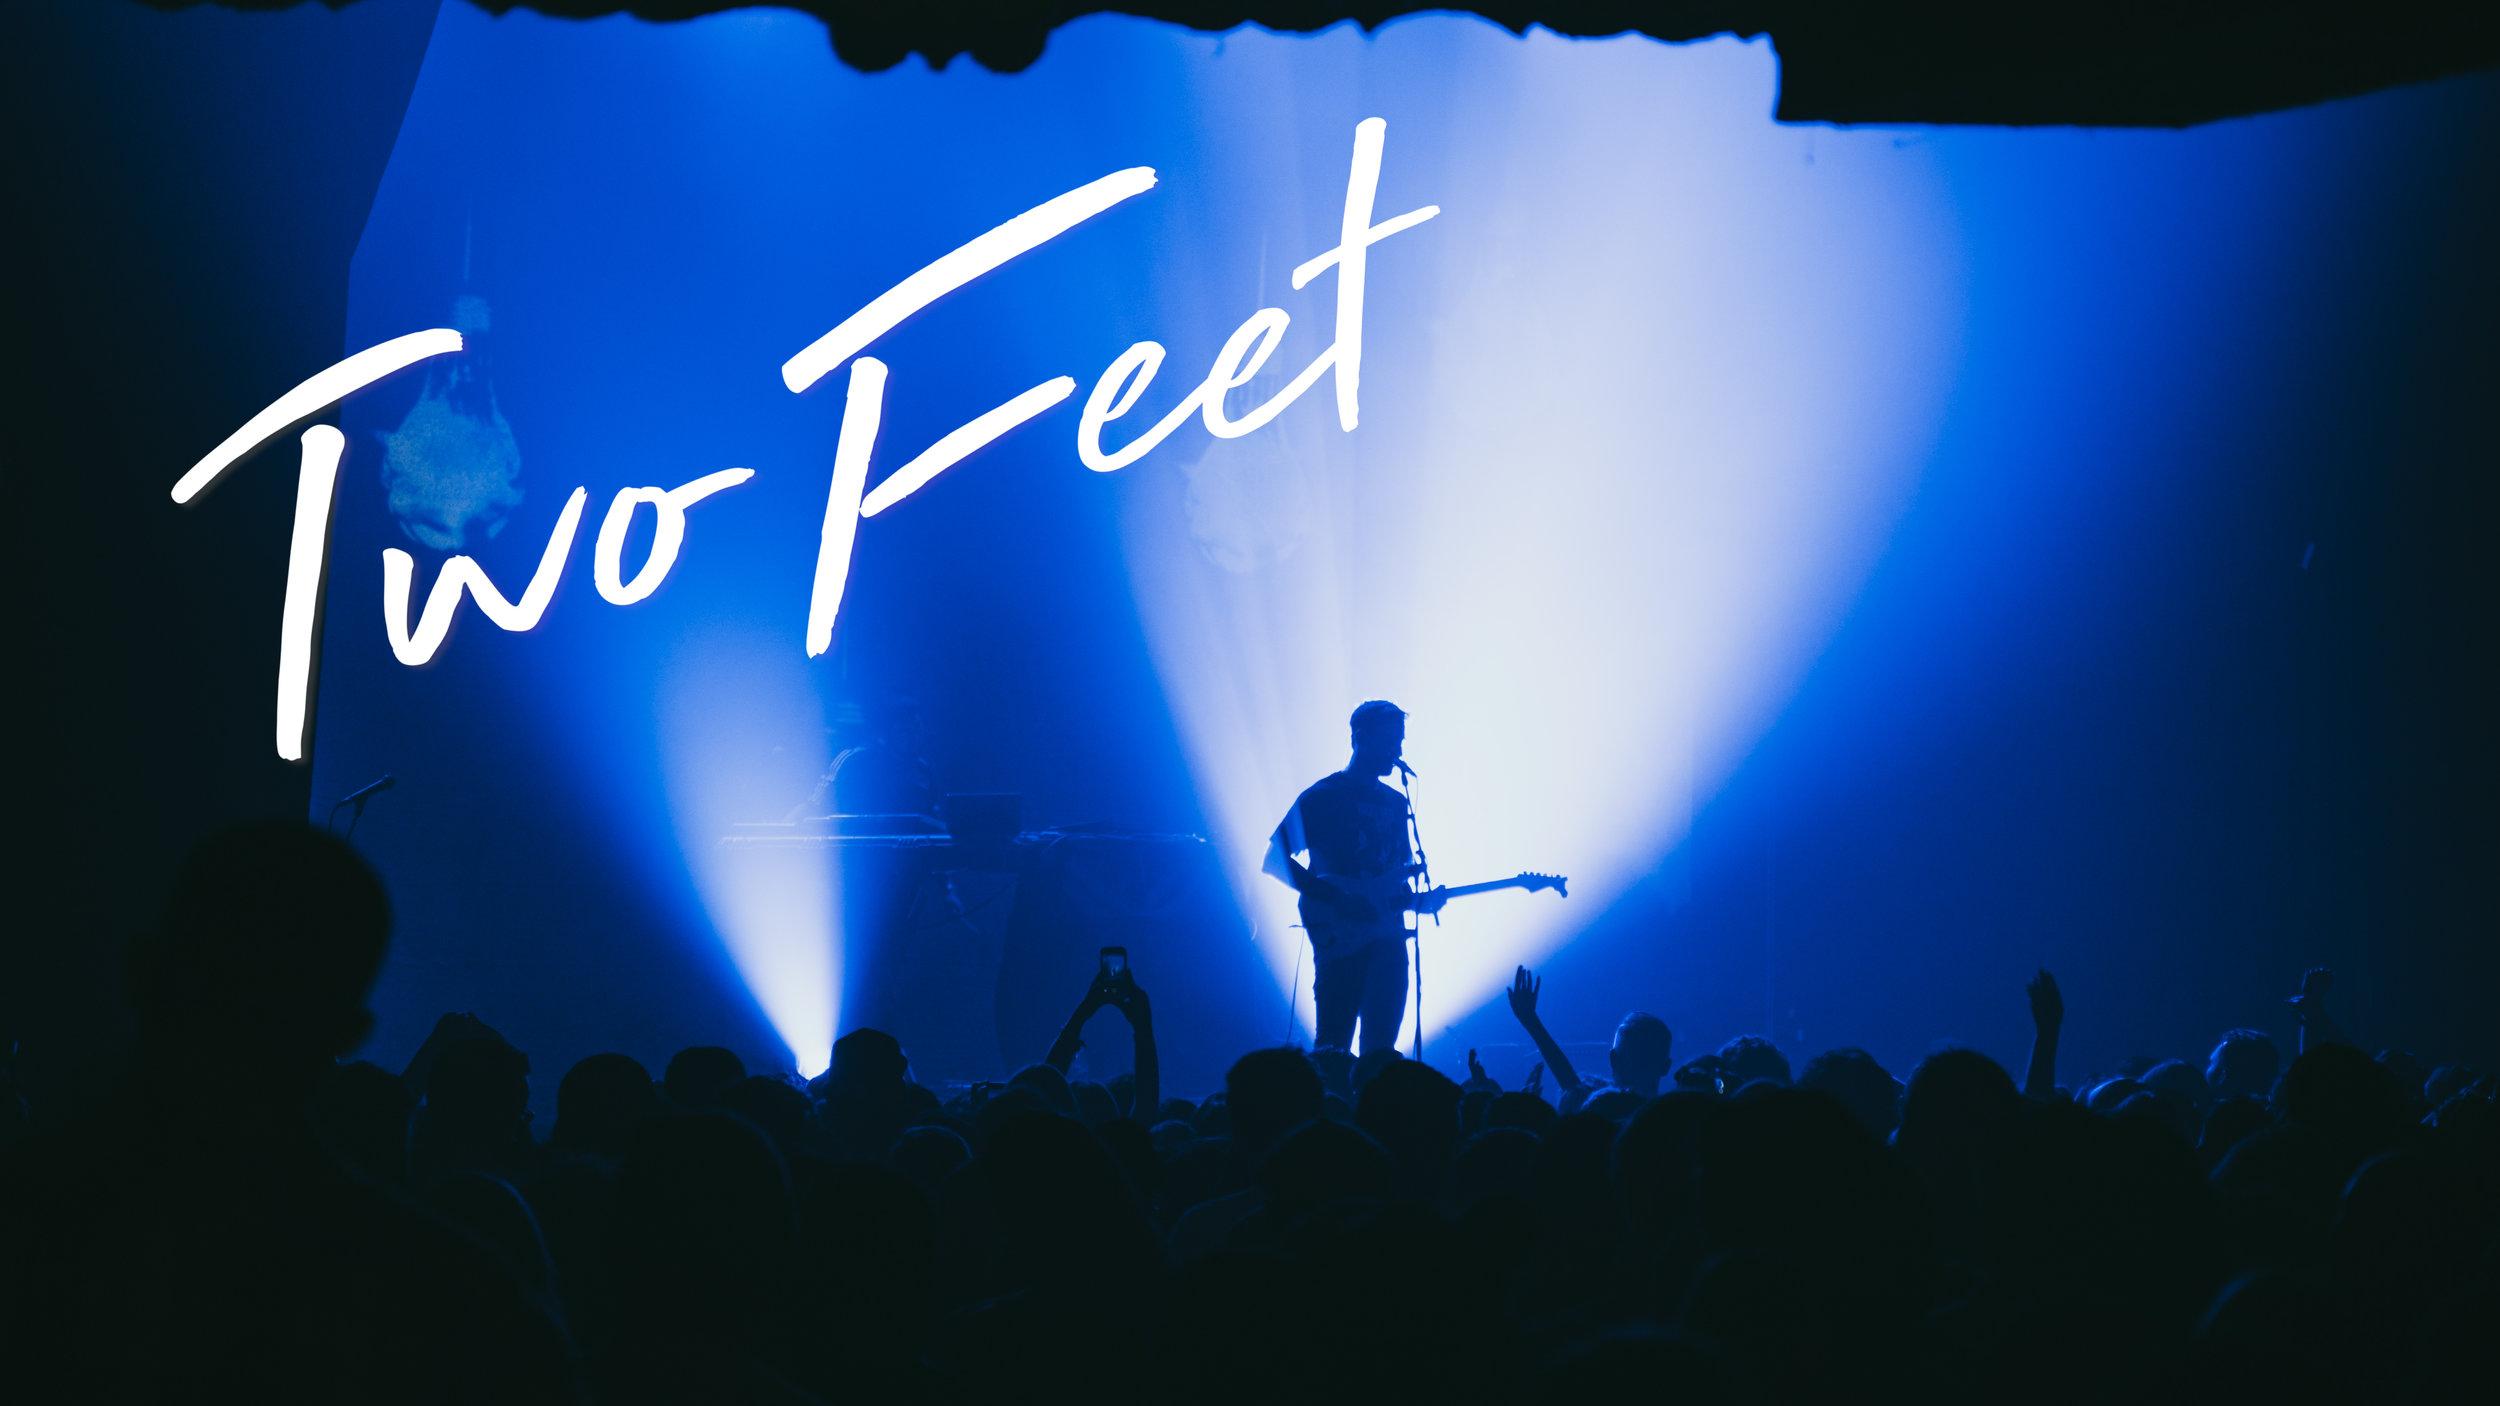 Nightlife, Concert, Club, EDM -